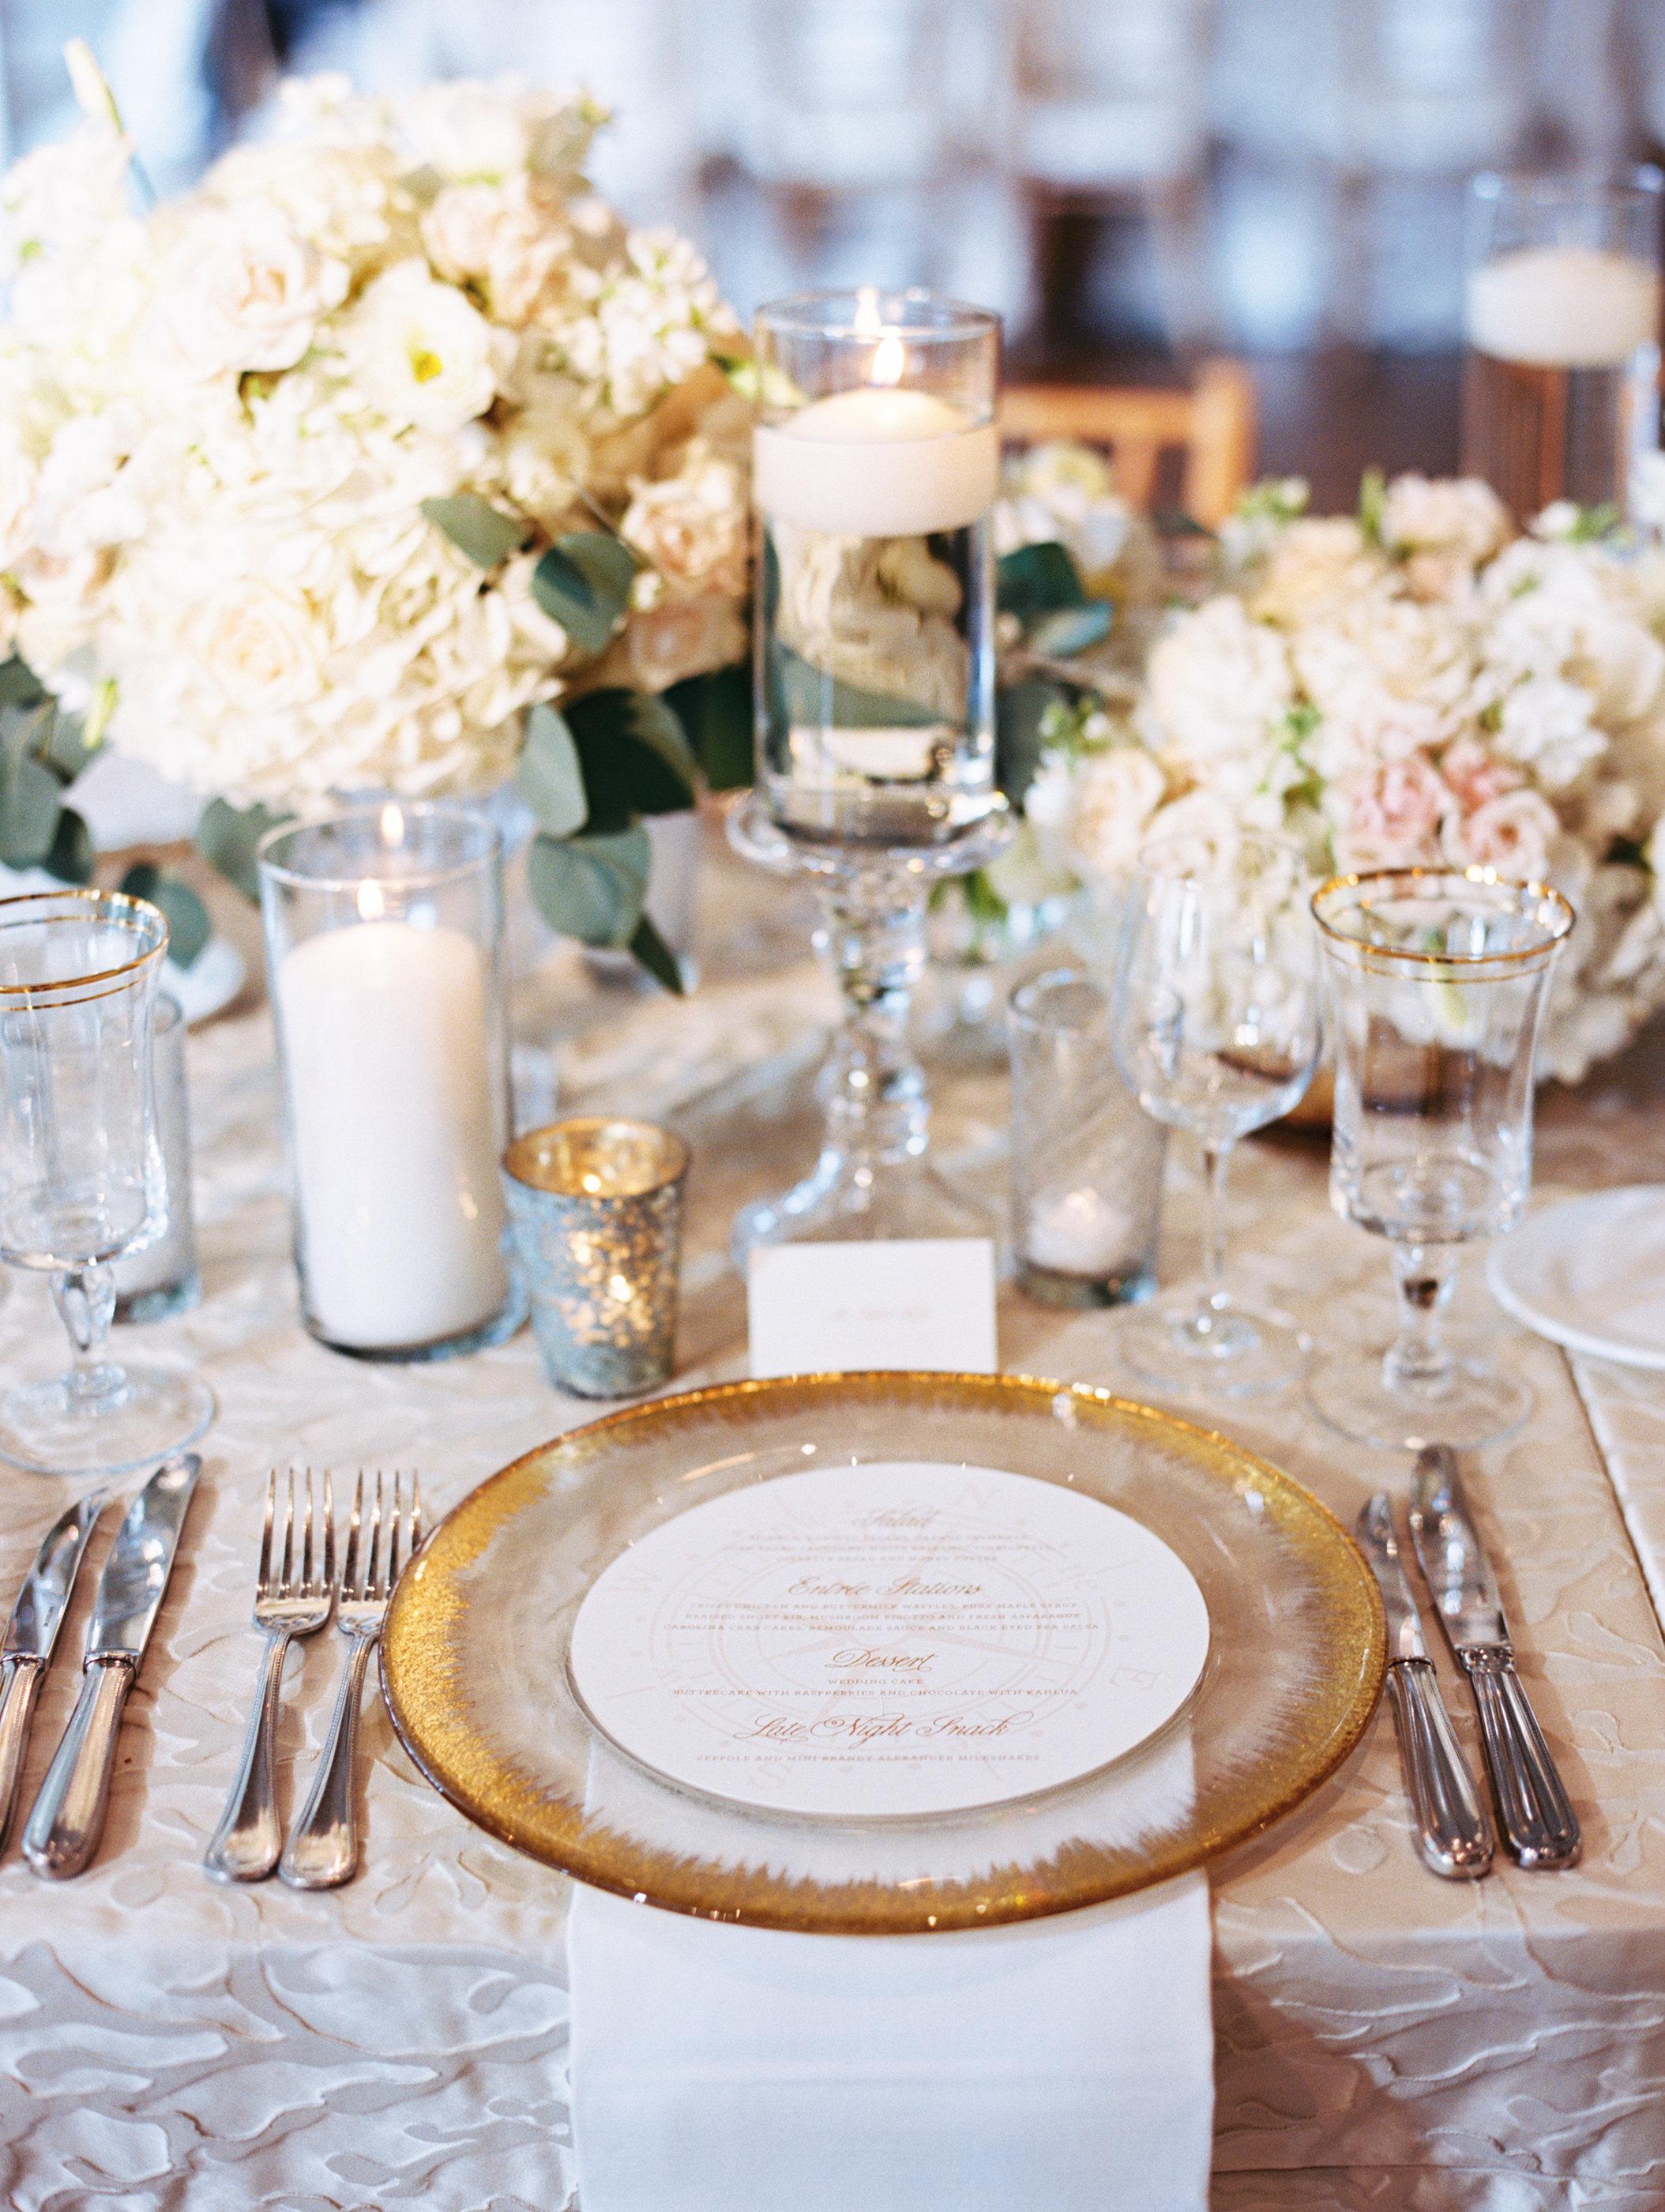 Tabletop Details - Kiawah Island, South Carolina - Fall Wedding - Julian Leaver Events